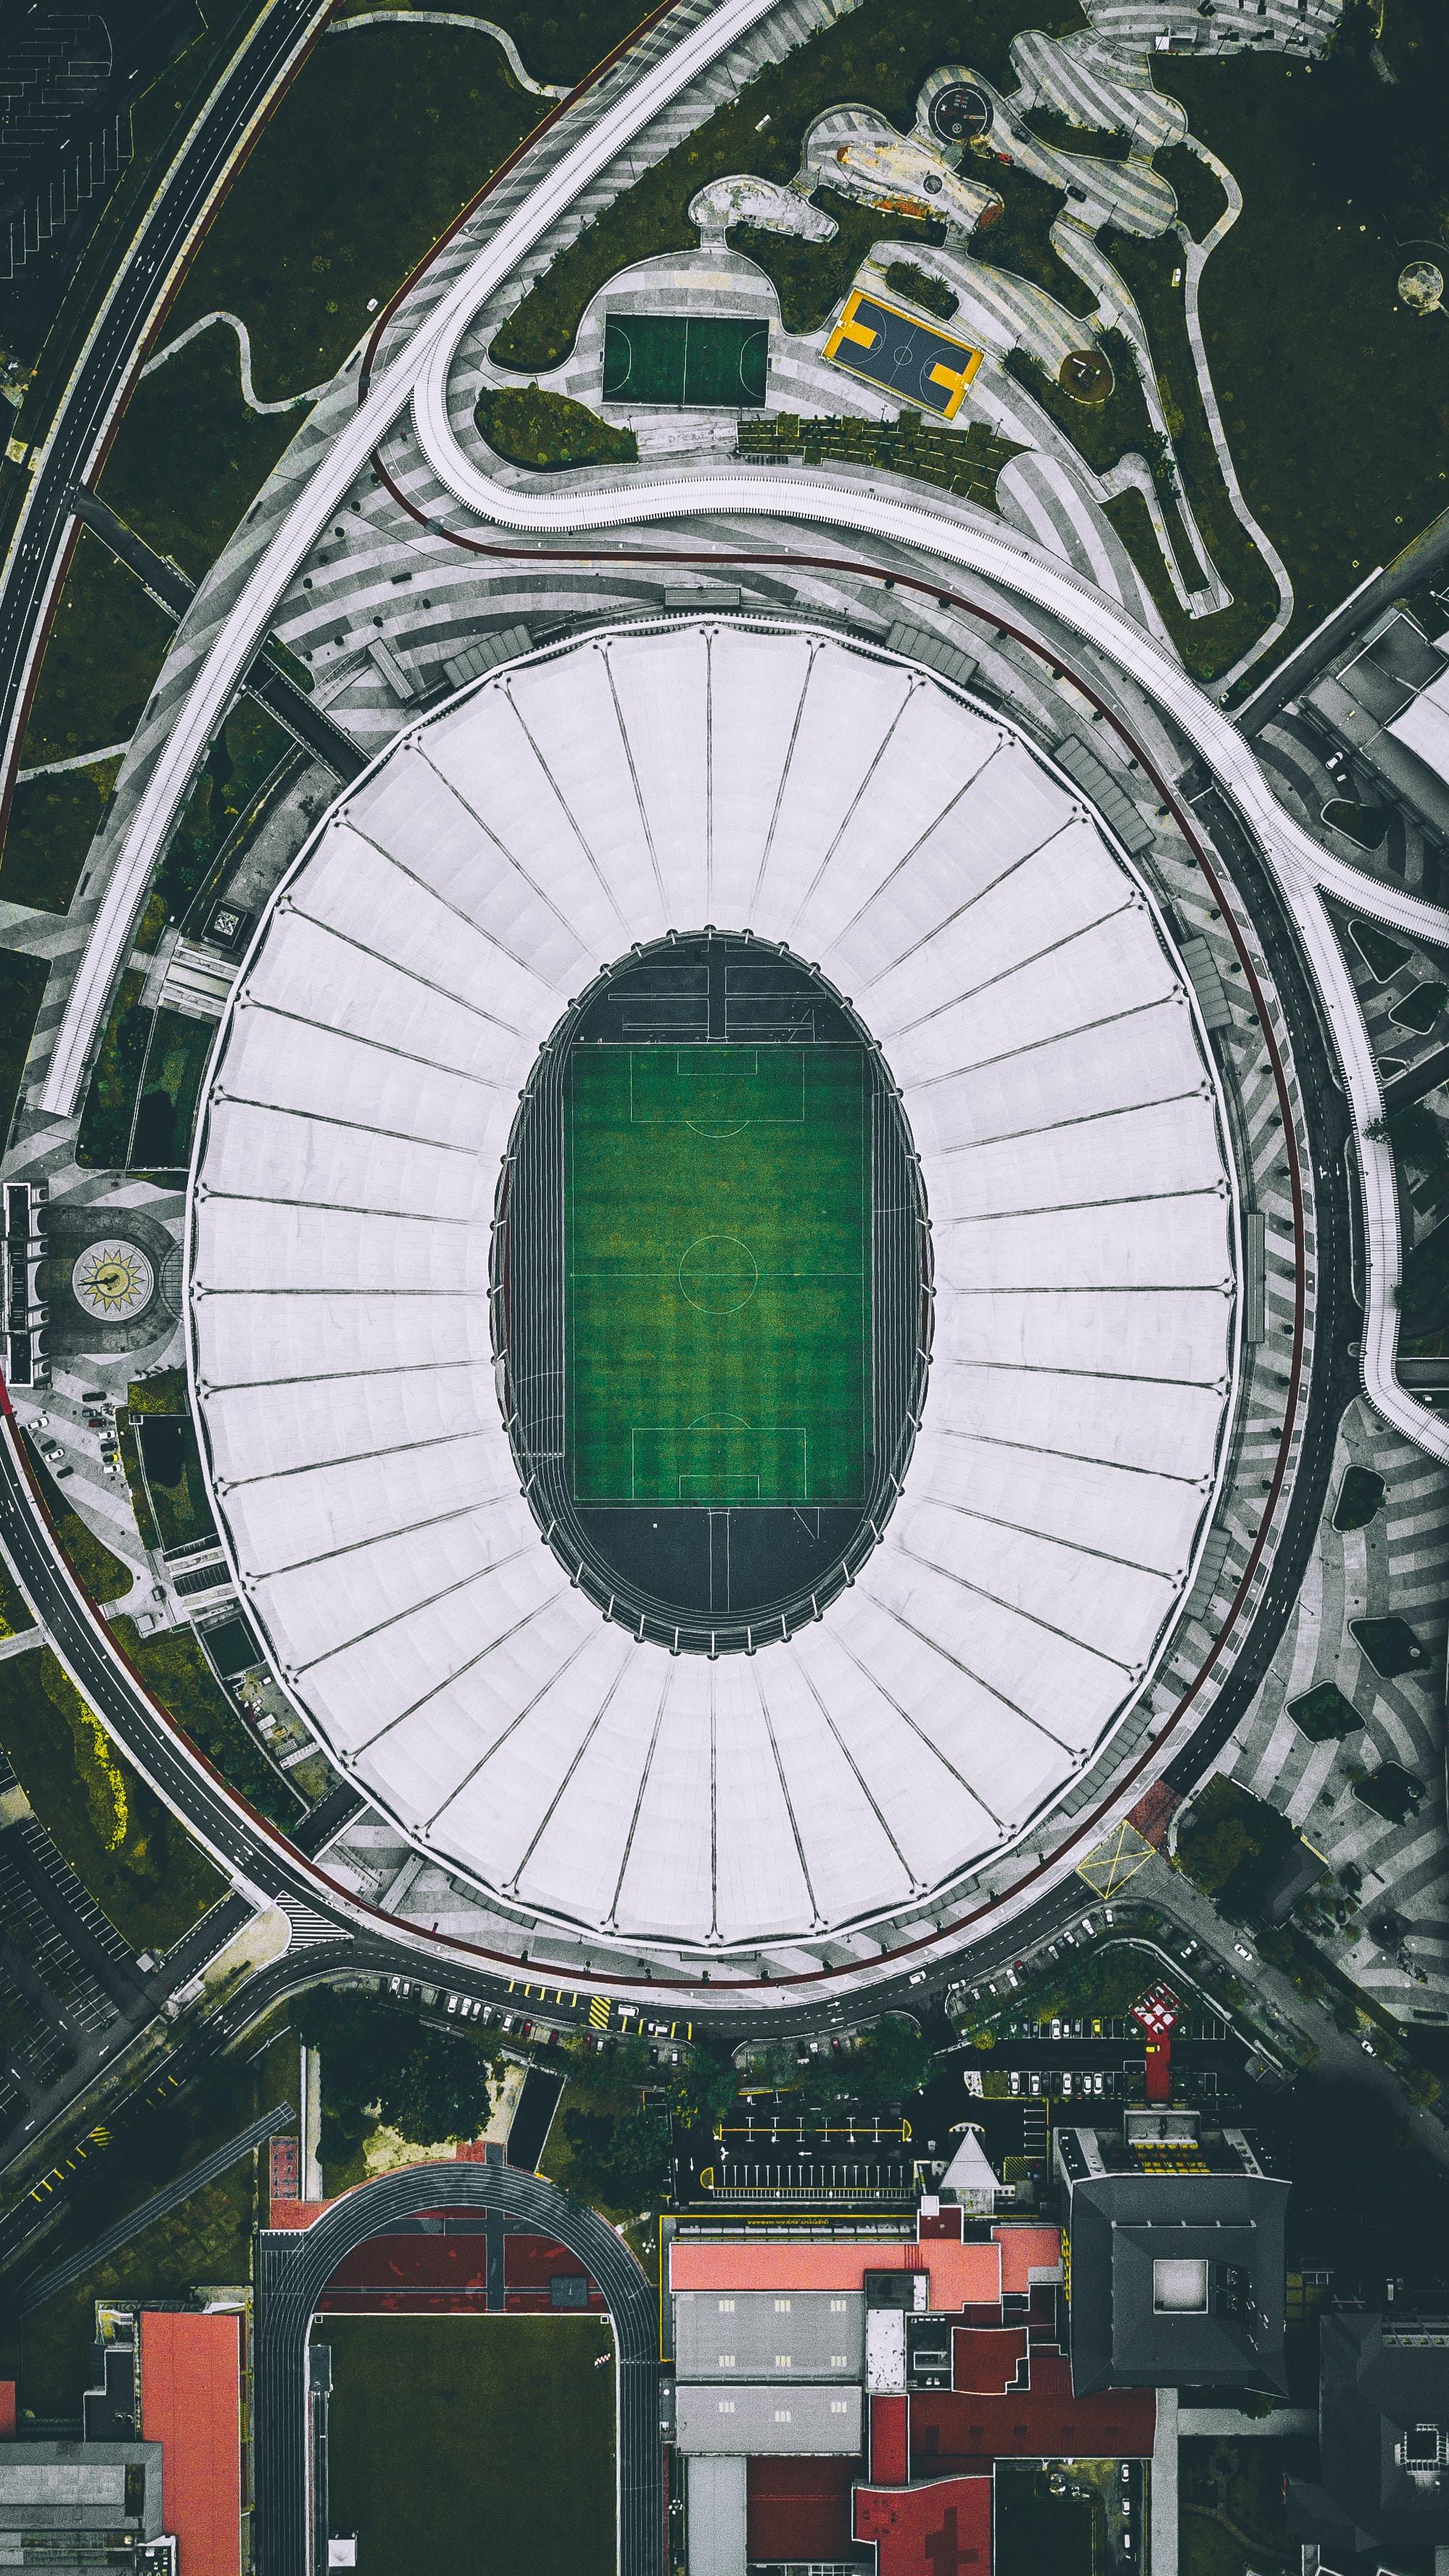 aerial photo of football field